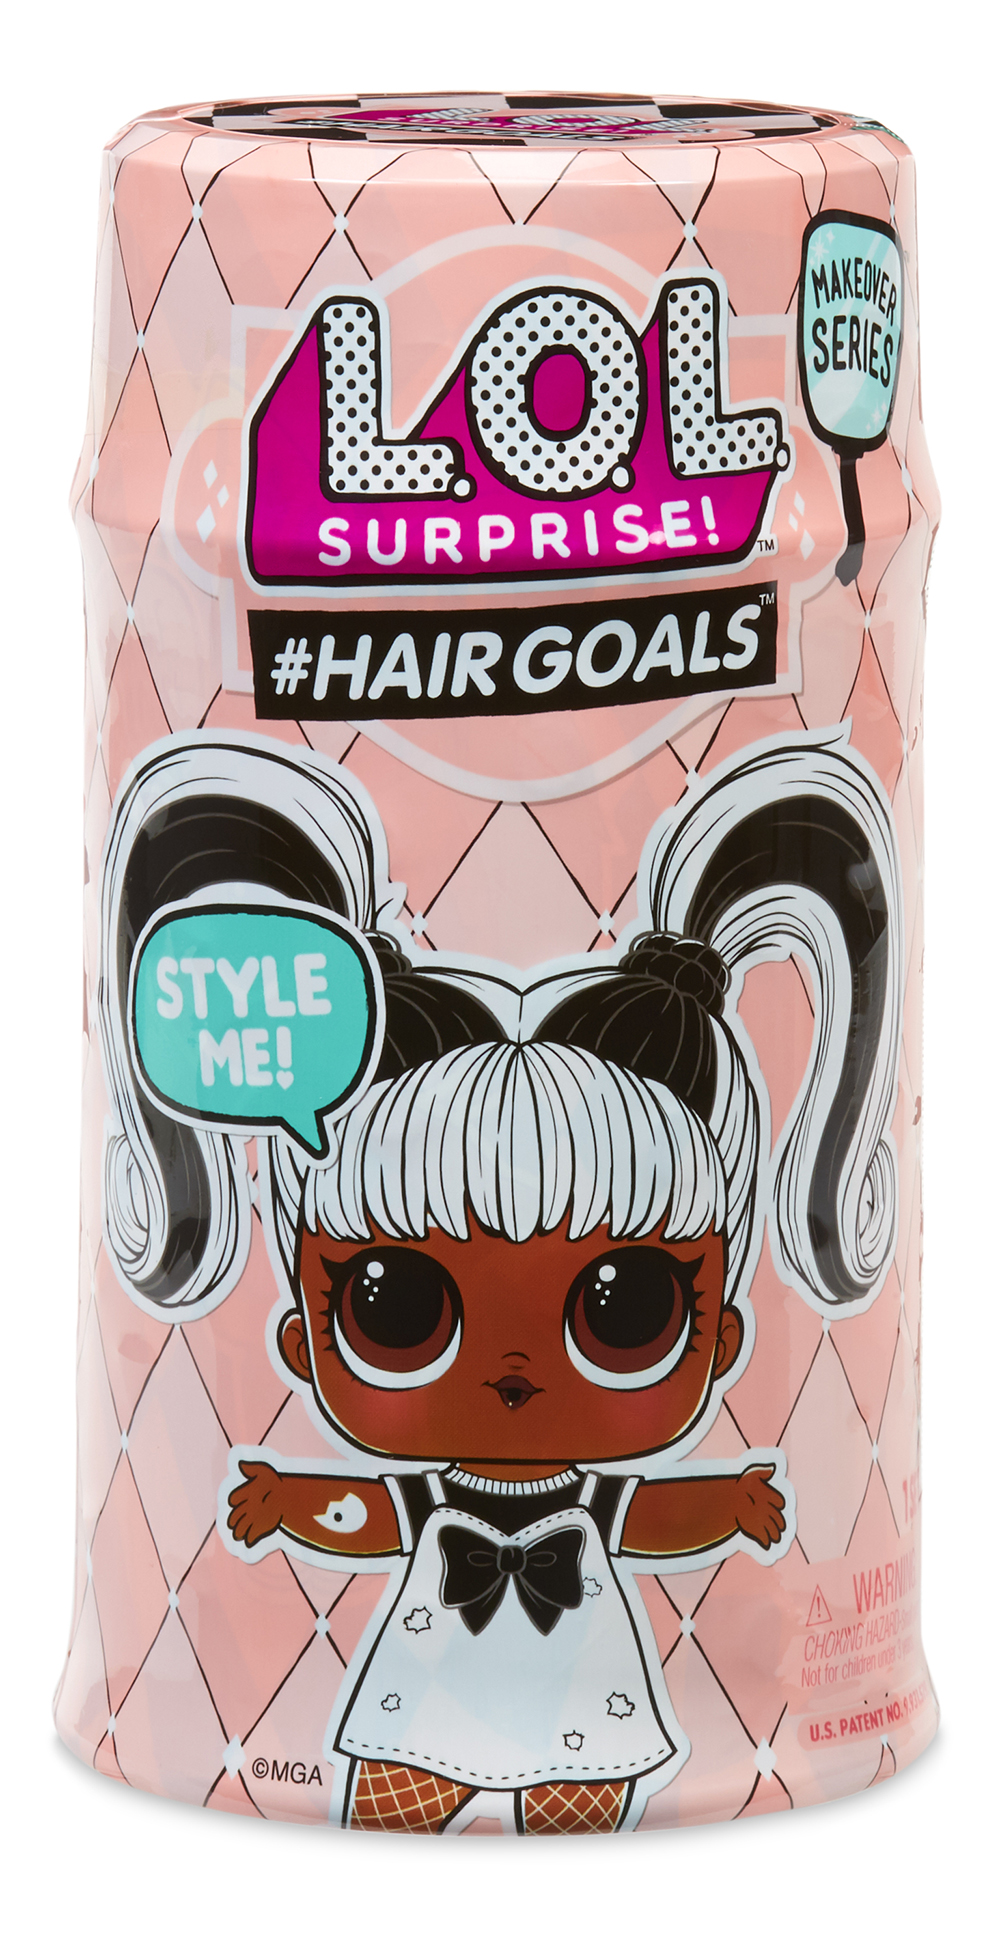 L.O.L Surprise! -  Hairgoals assortiment